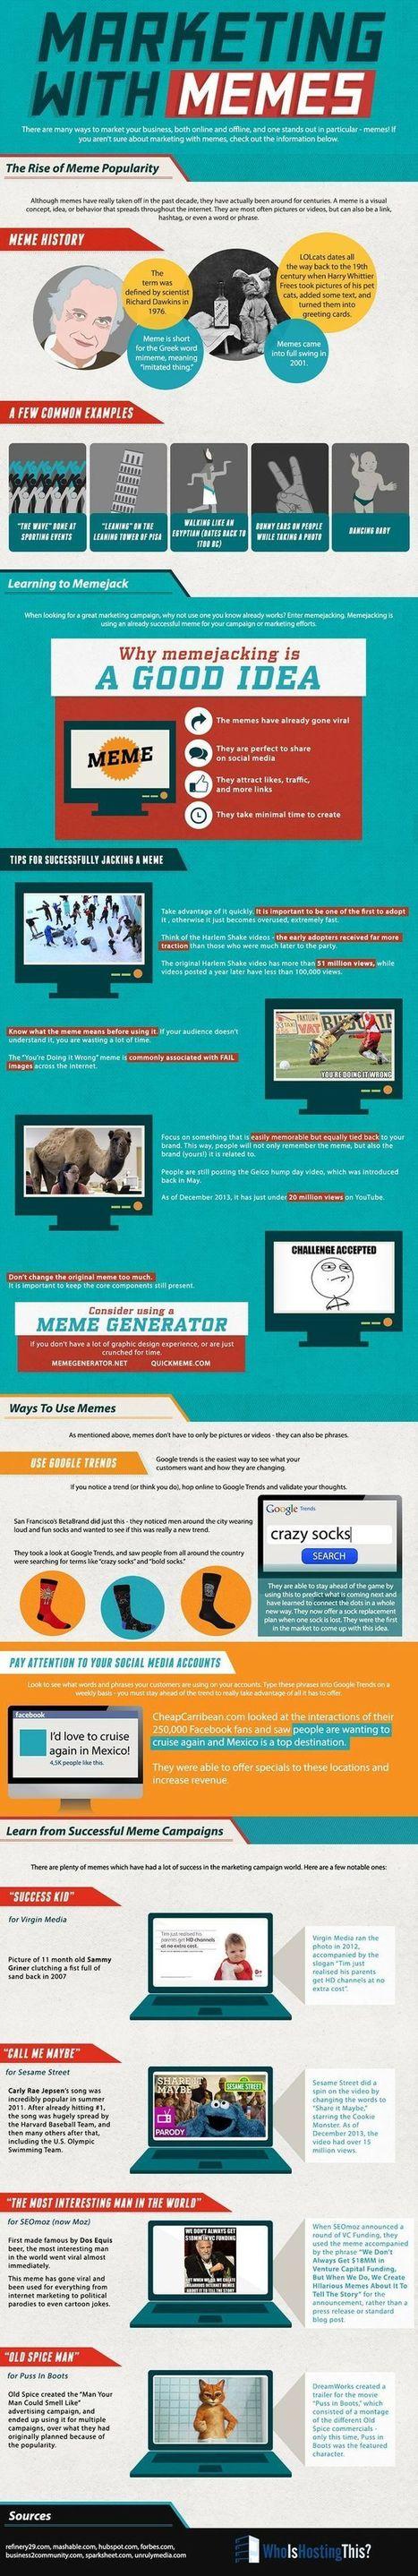 Marketing with memes | Seo, Social Media Marketing | Scoop.it